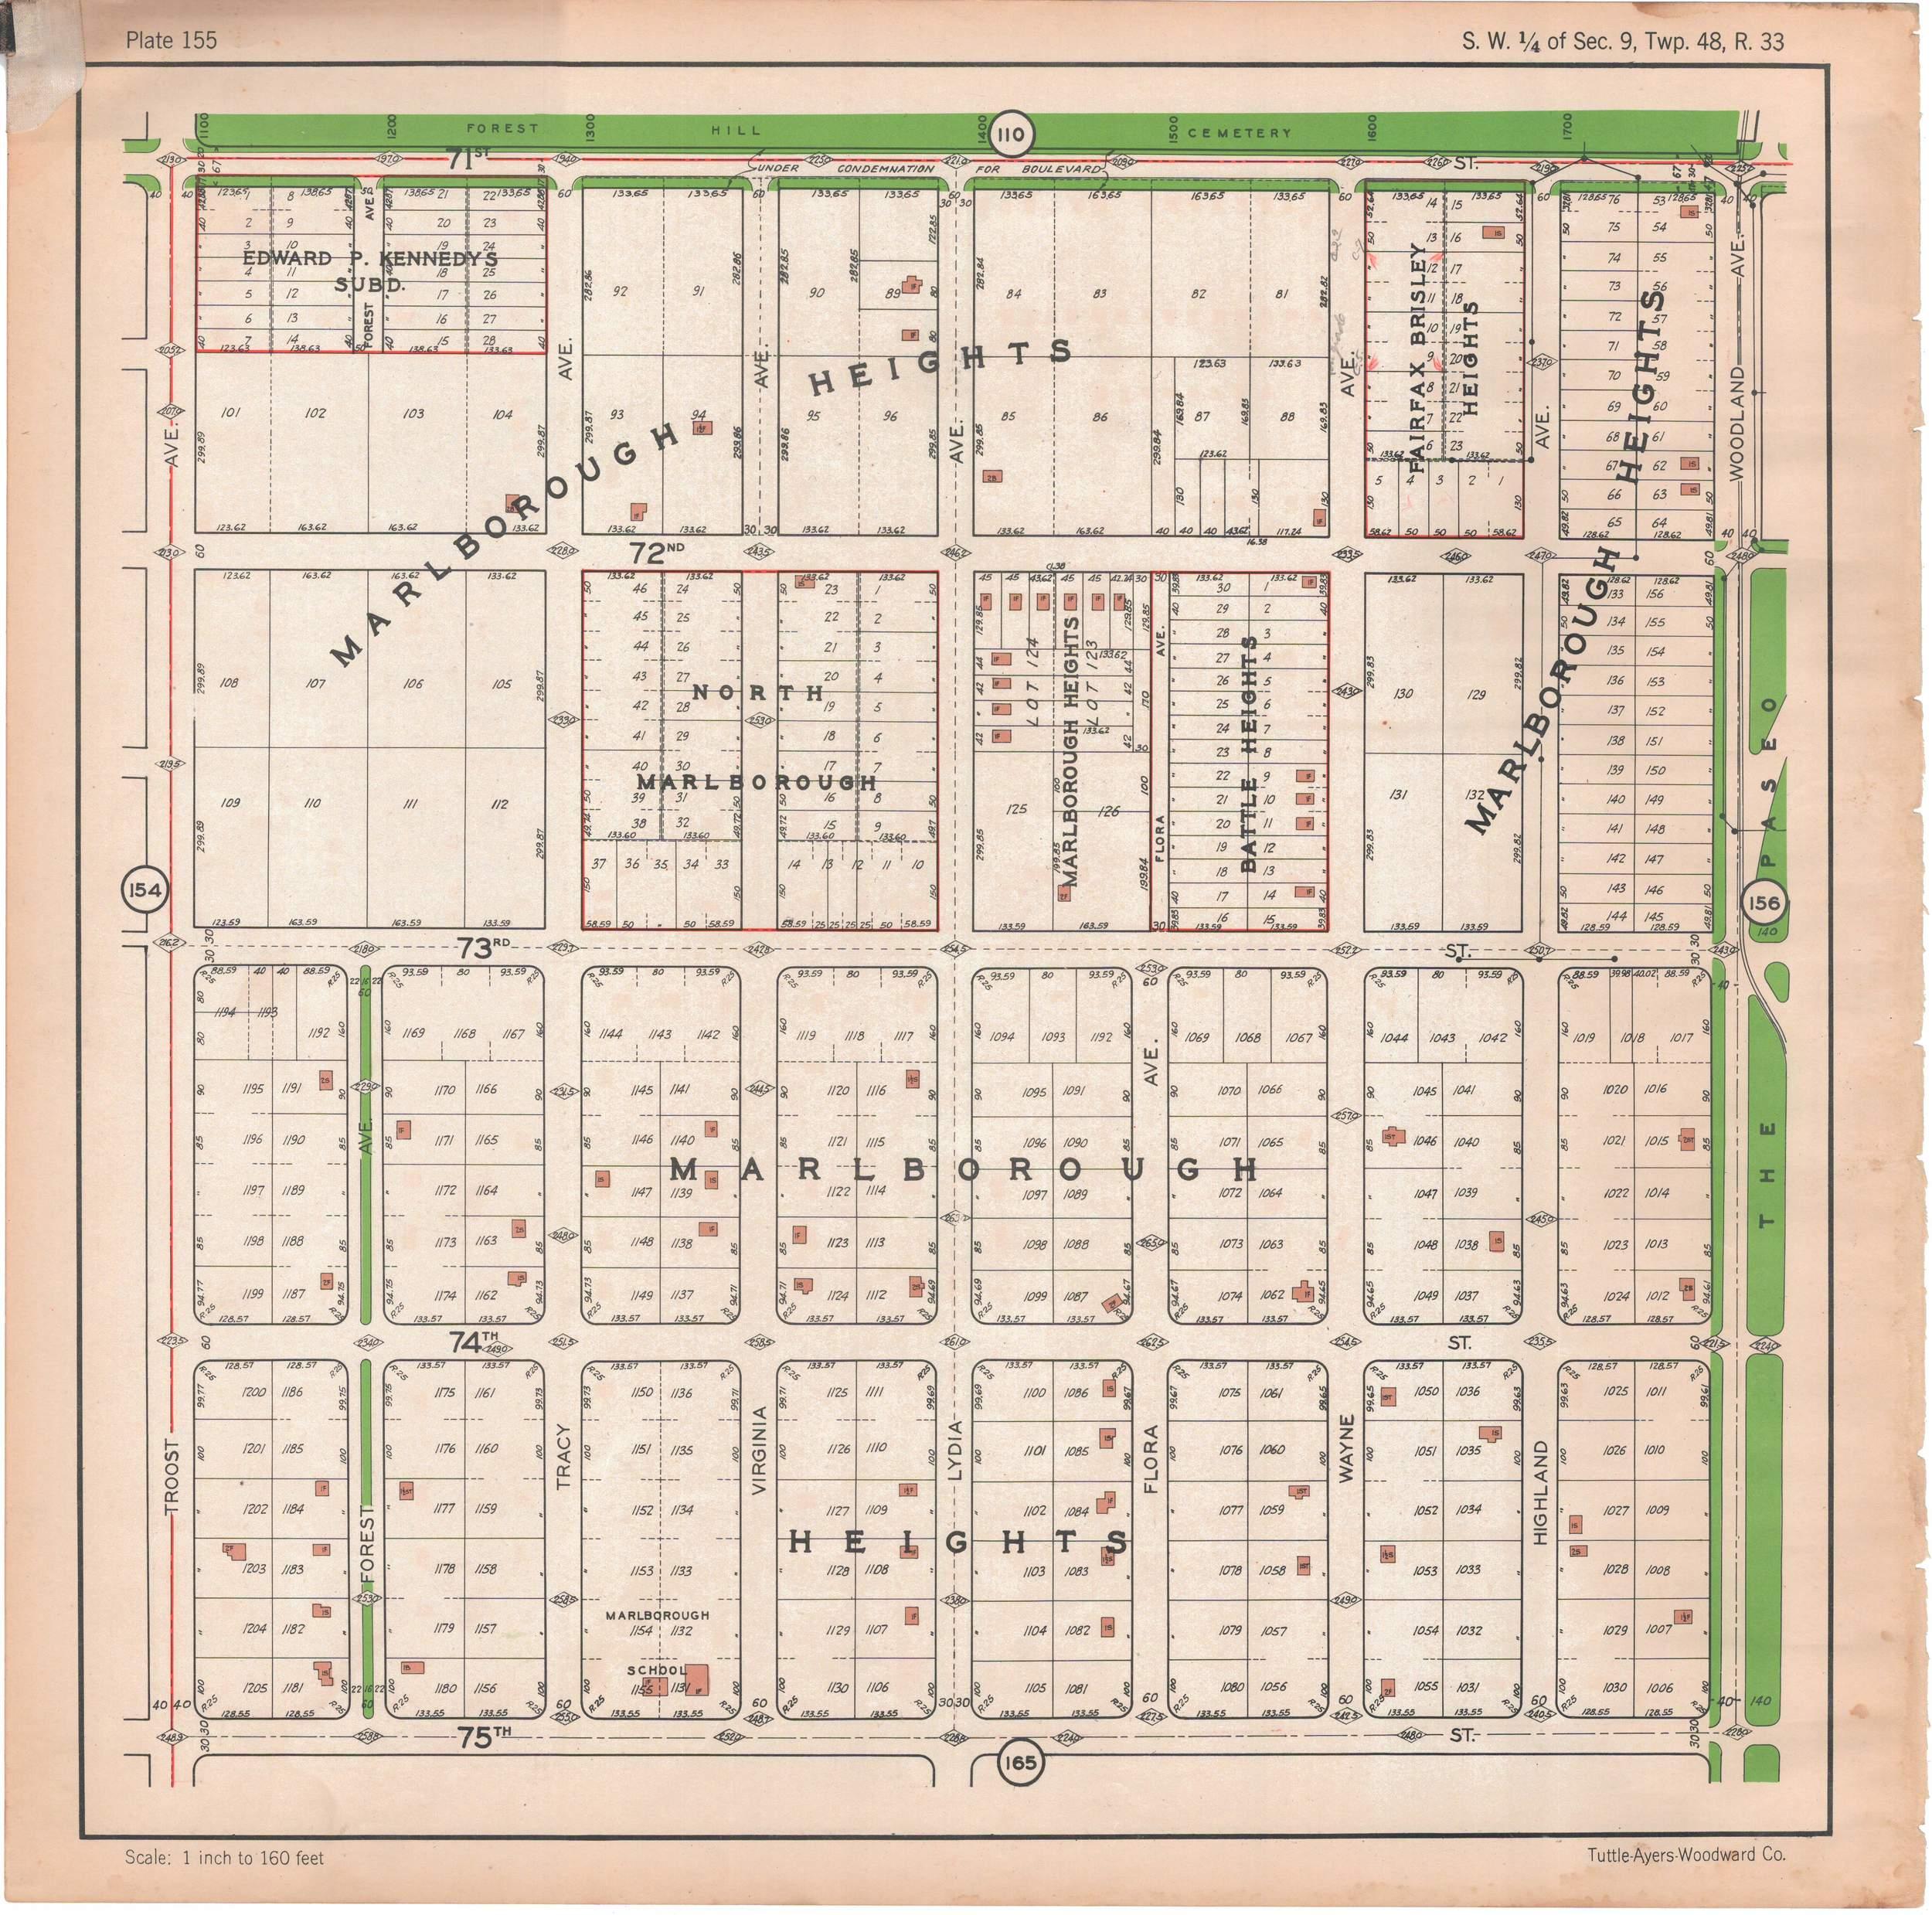 1925 TUTTLE_AYERS_Plate_155.JPG